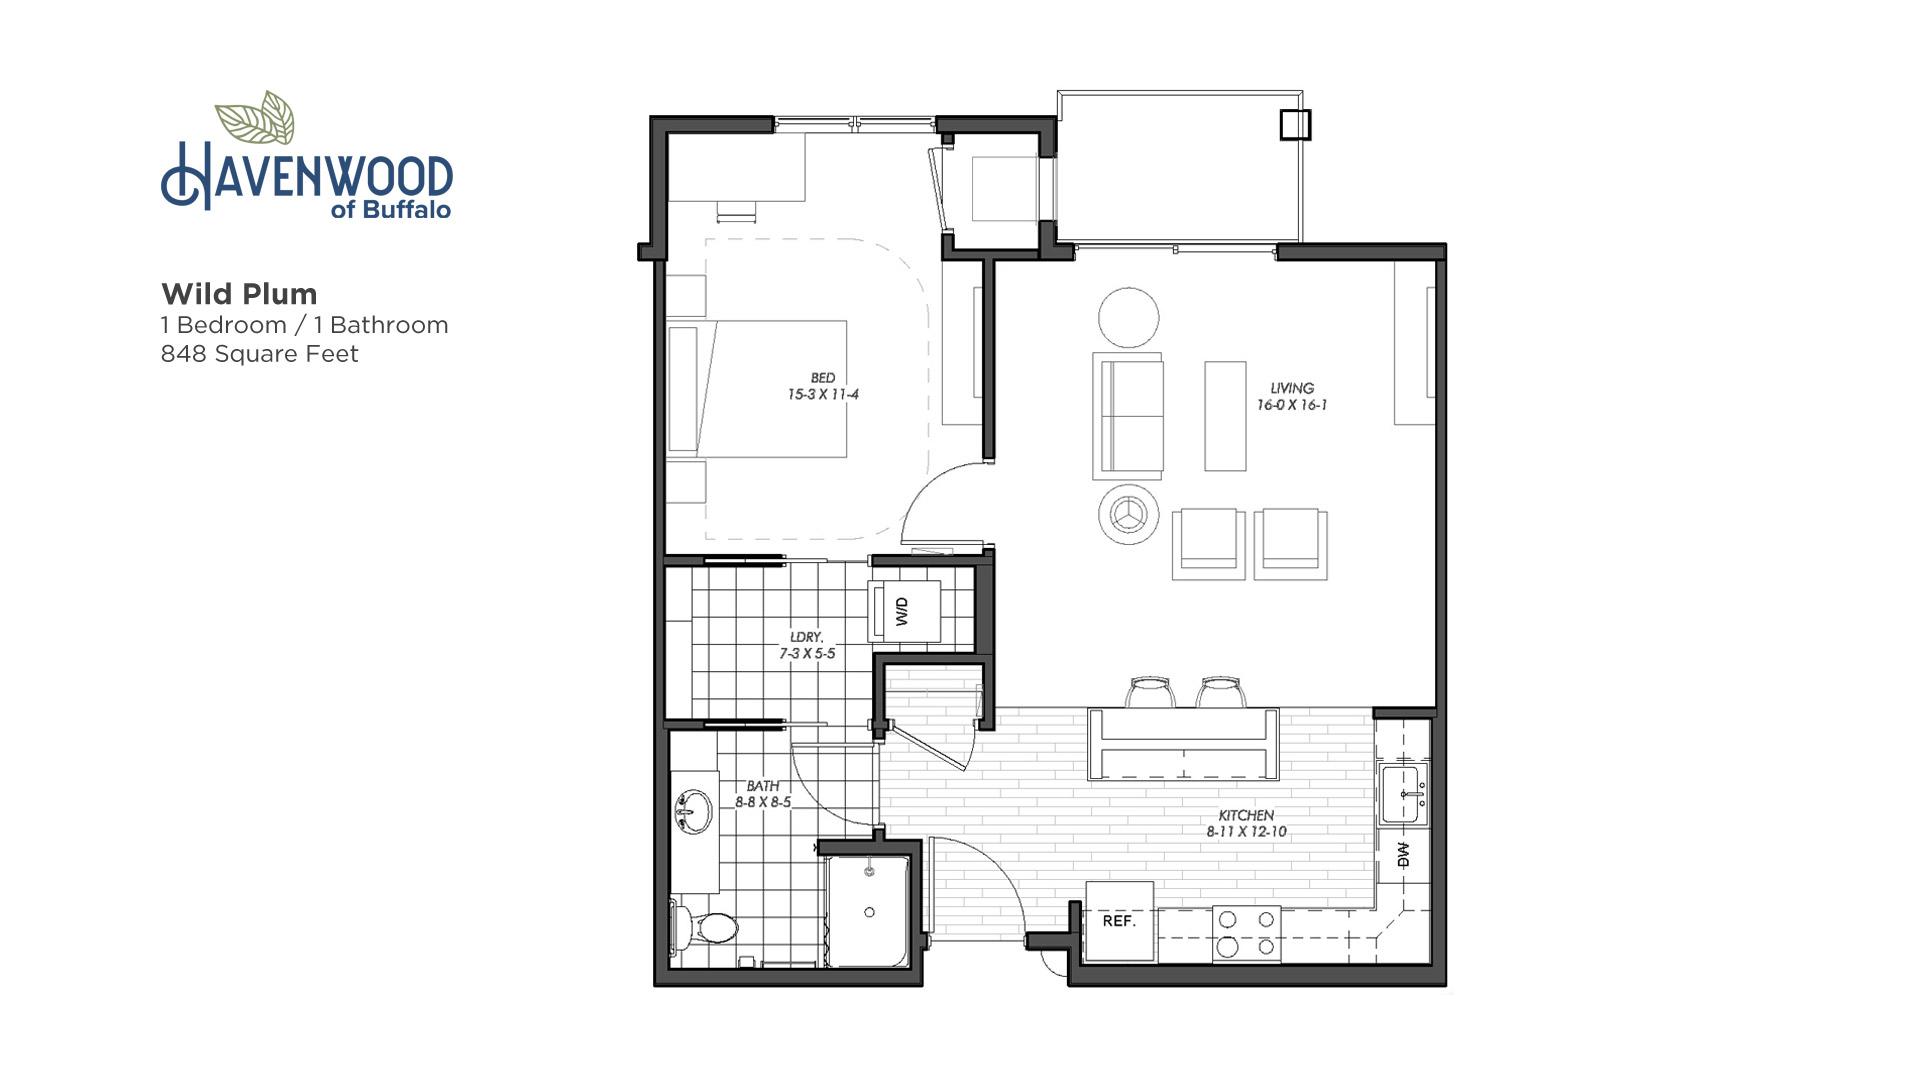 Havenwood of Buffalo Wild Plum Floor Plan